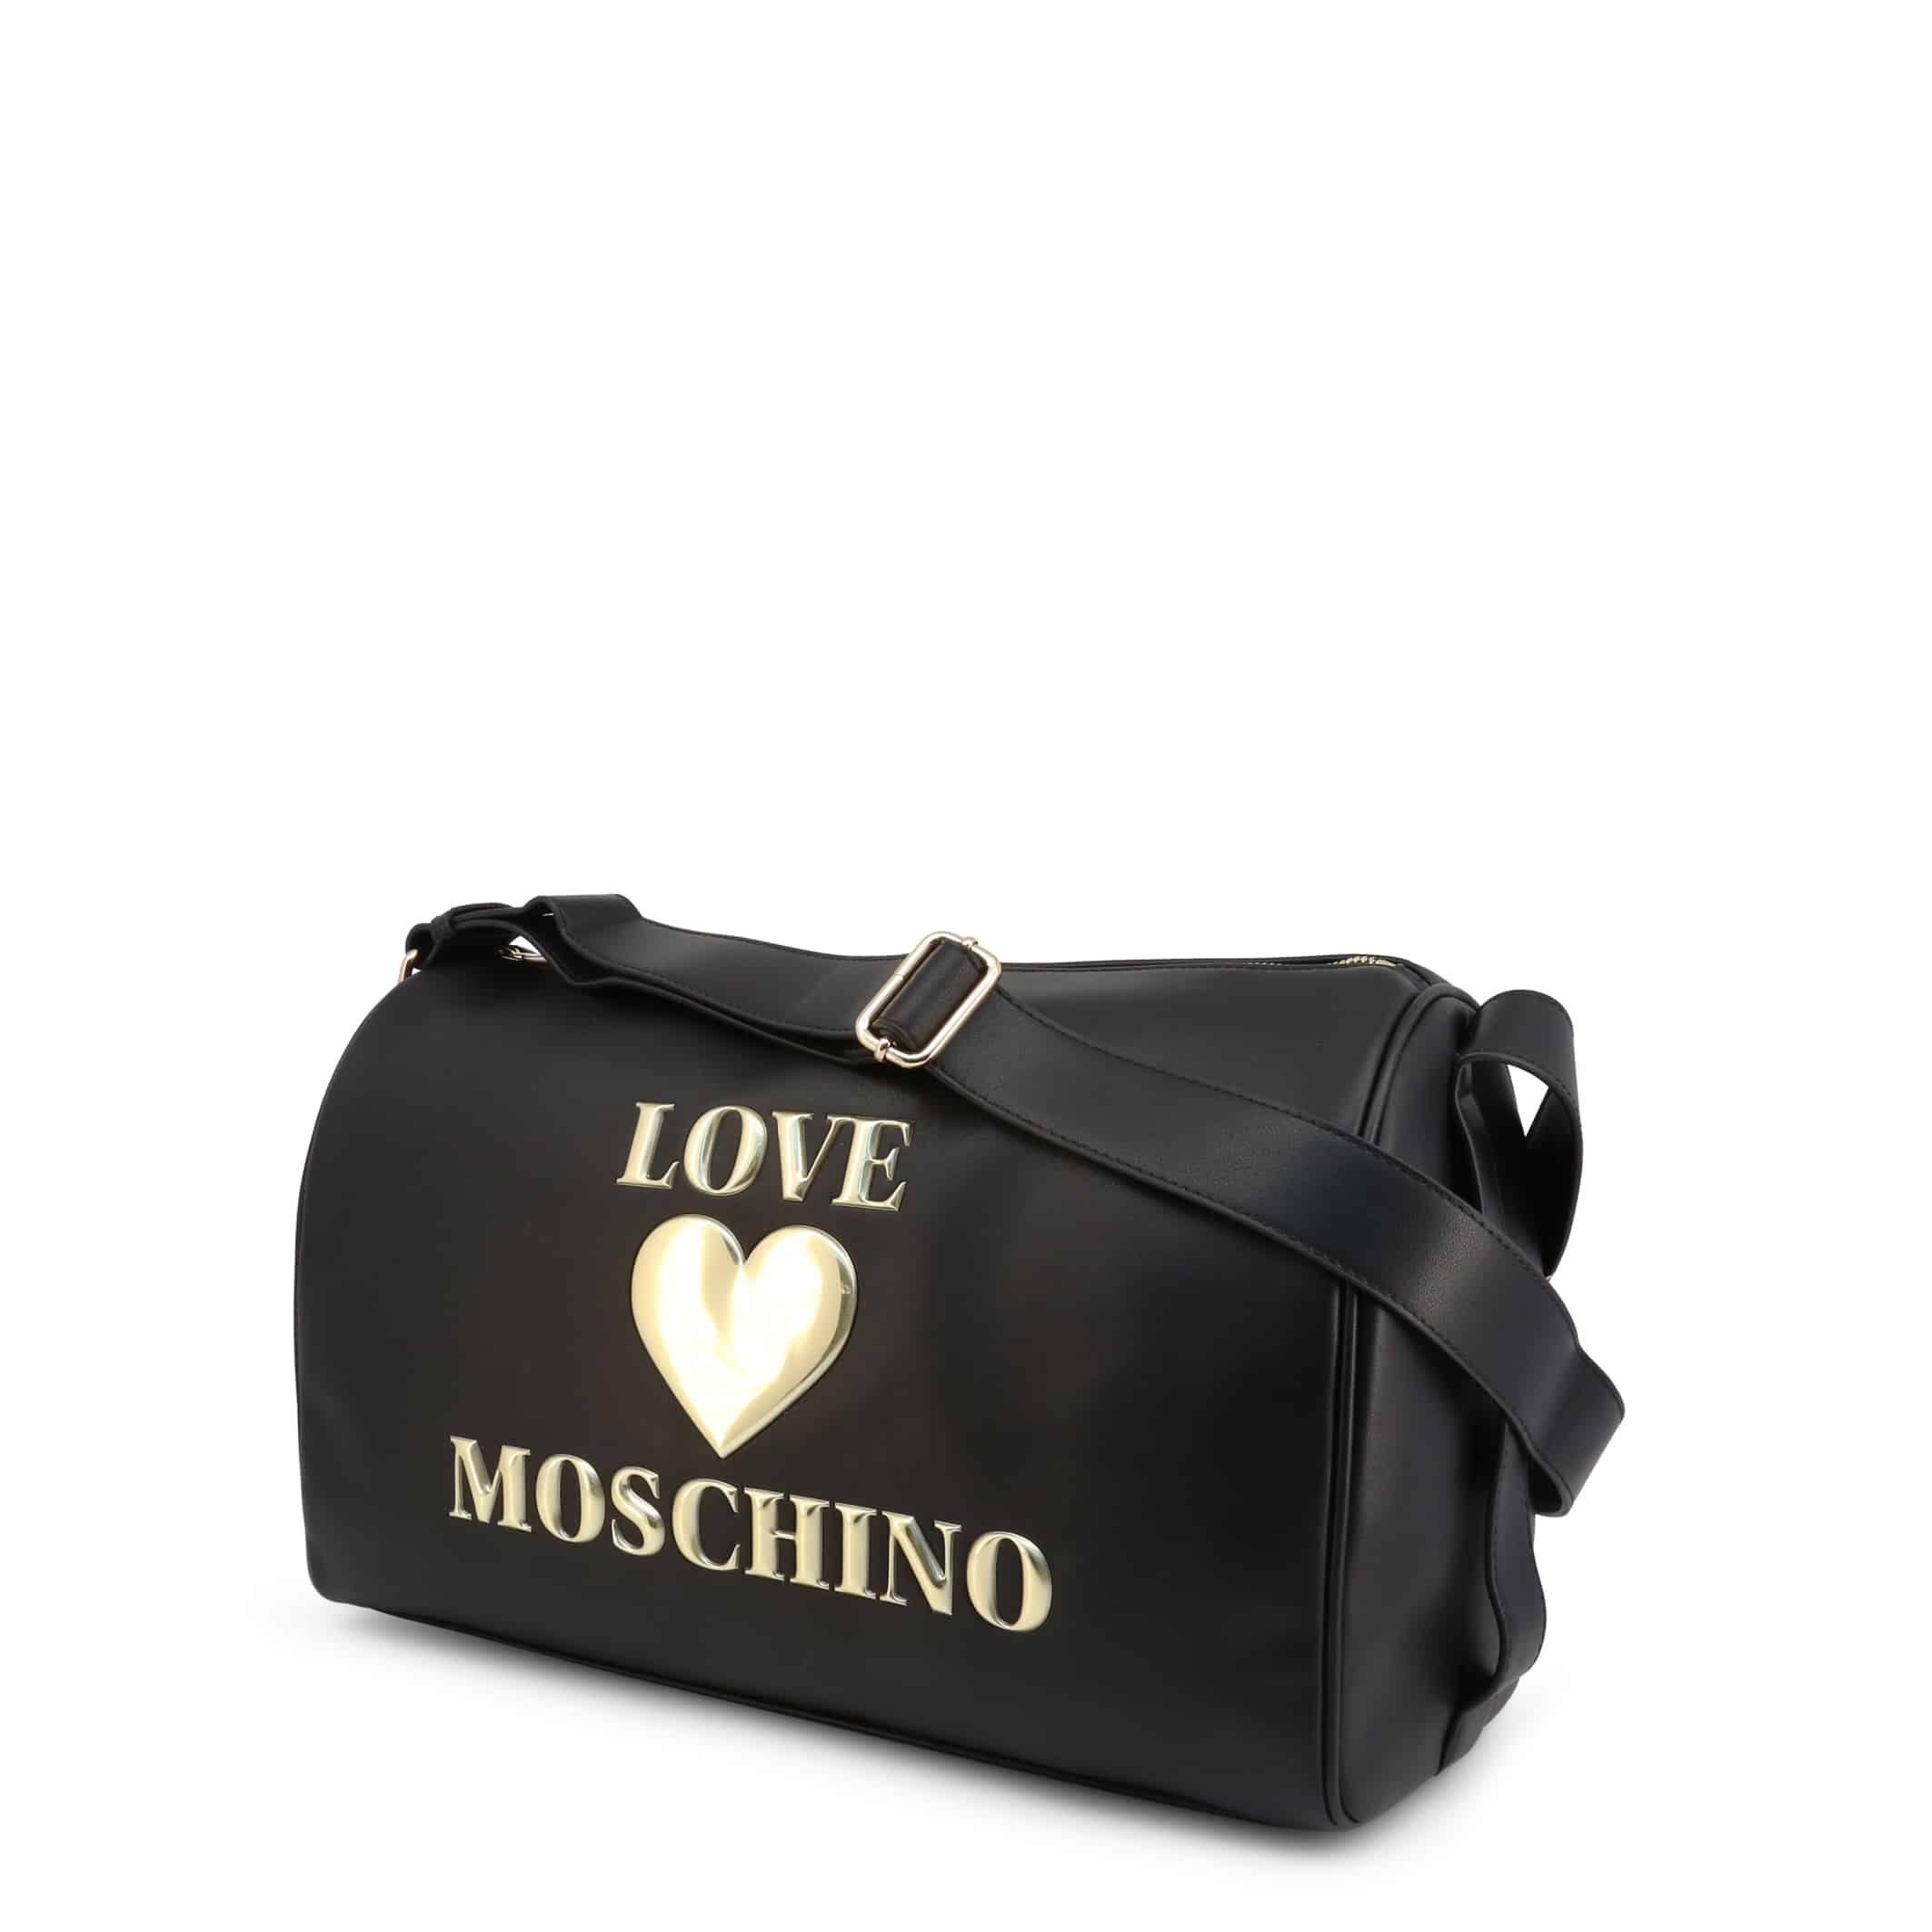 8Fa8A070 8D82 11Eb B70B 754727E0617F Love Moschino - Jc4039Pp1Ble - Black